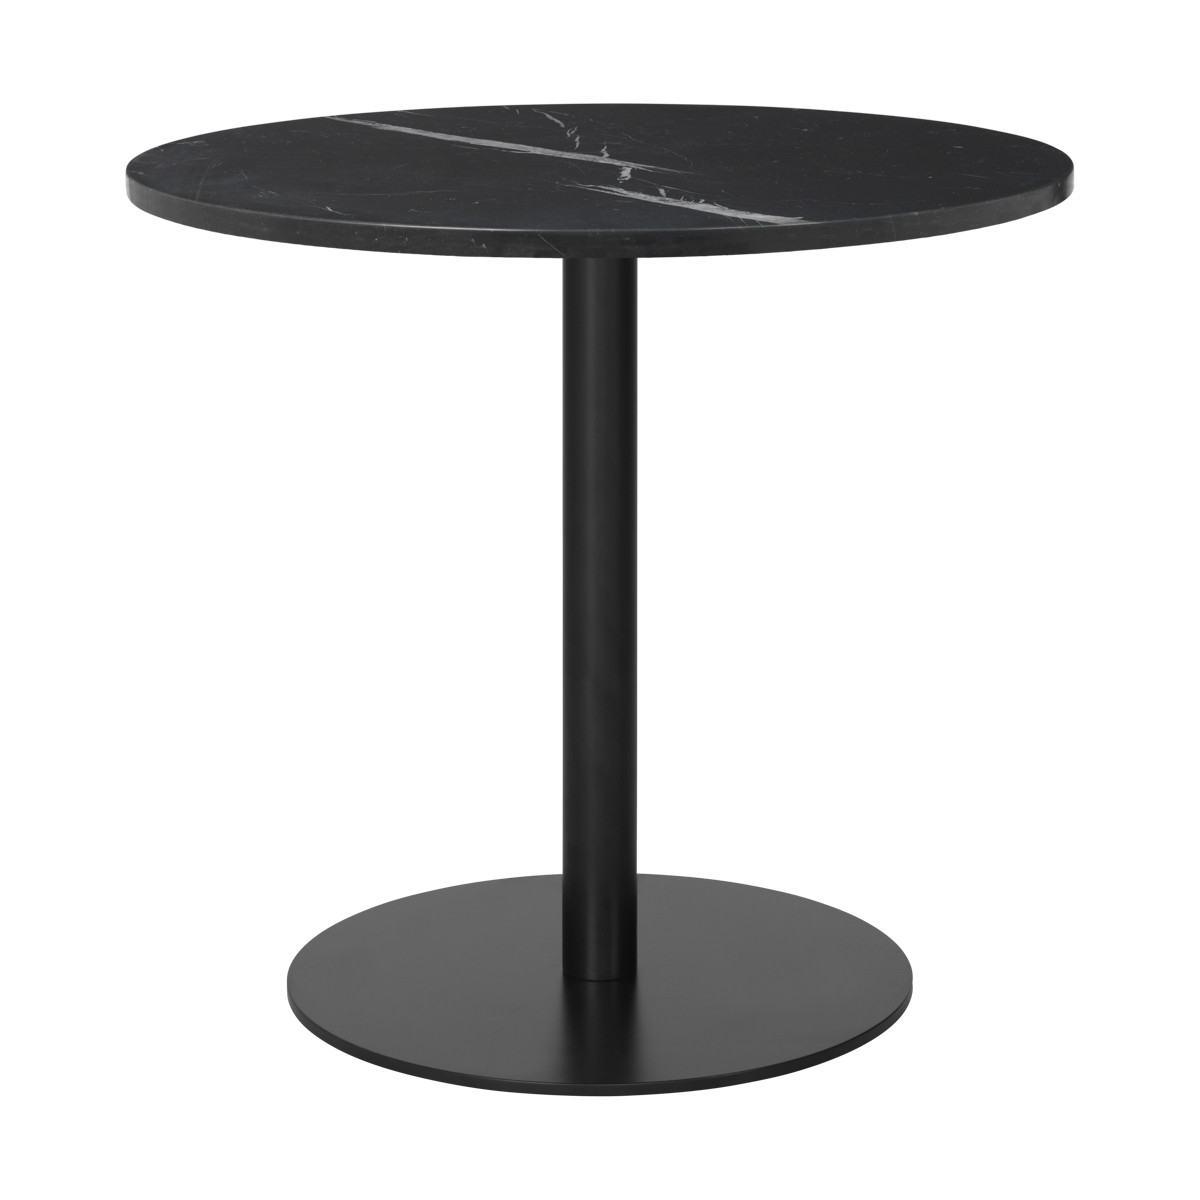 Gubi 1.0 Dining Table - Round, 80cm Diameter